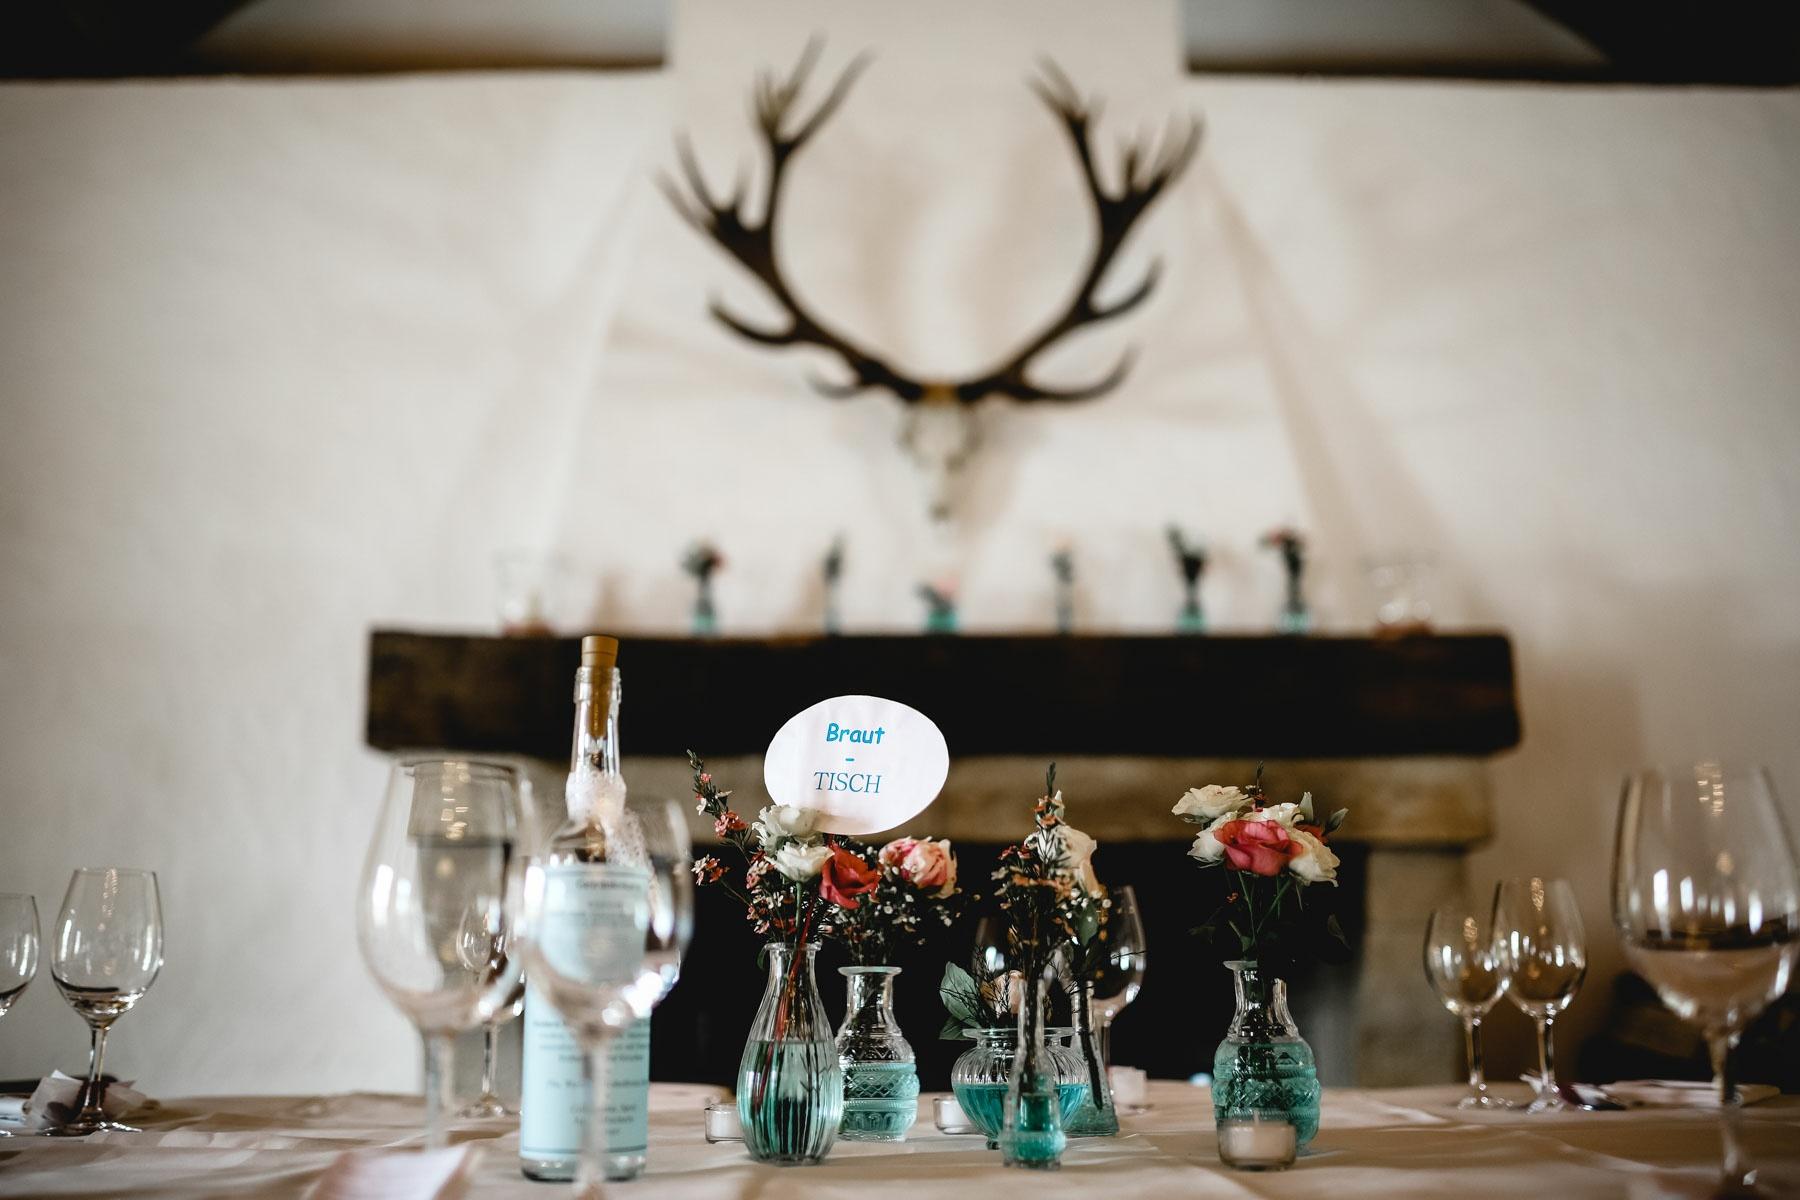 Hochzeitsreportage HofgutMaisenburg SilviaMichael Hochzeitsfotograf Top Hochzeitsfotografen MarcusBraun Fotografie www.mb fotografie.de 007 570x380 - Hochzeitsfotografie